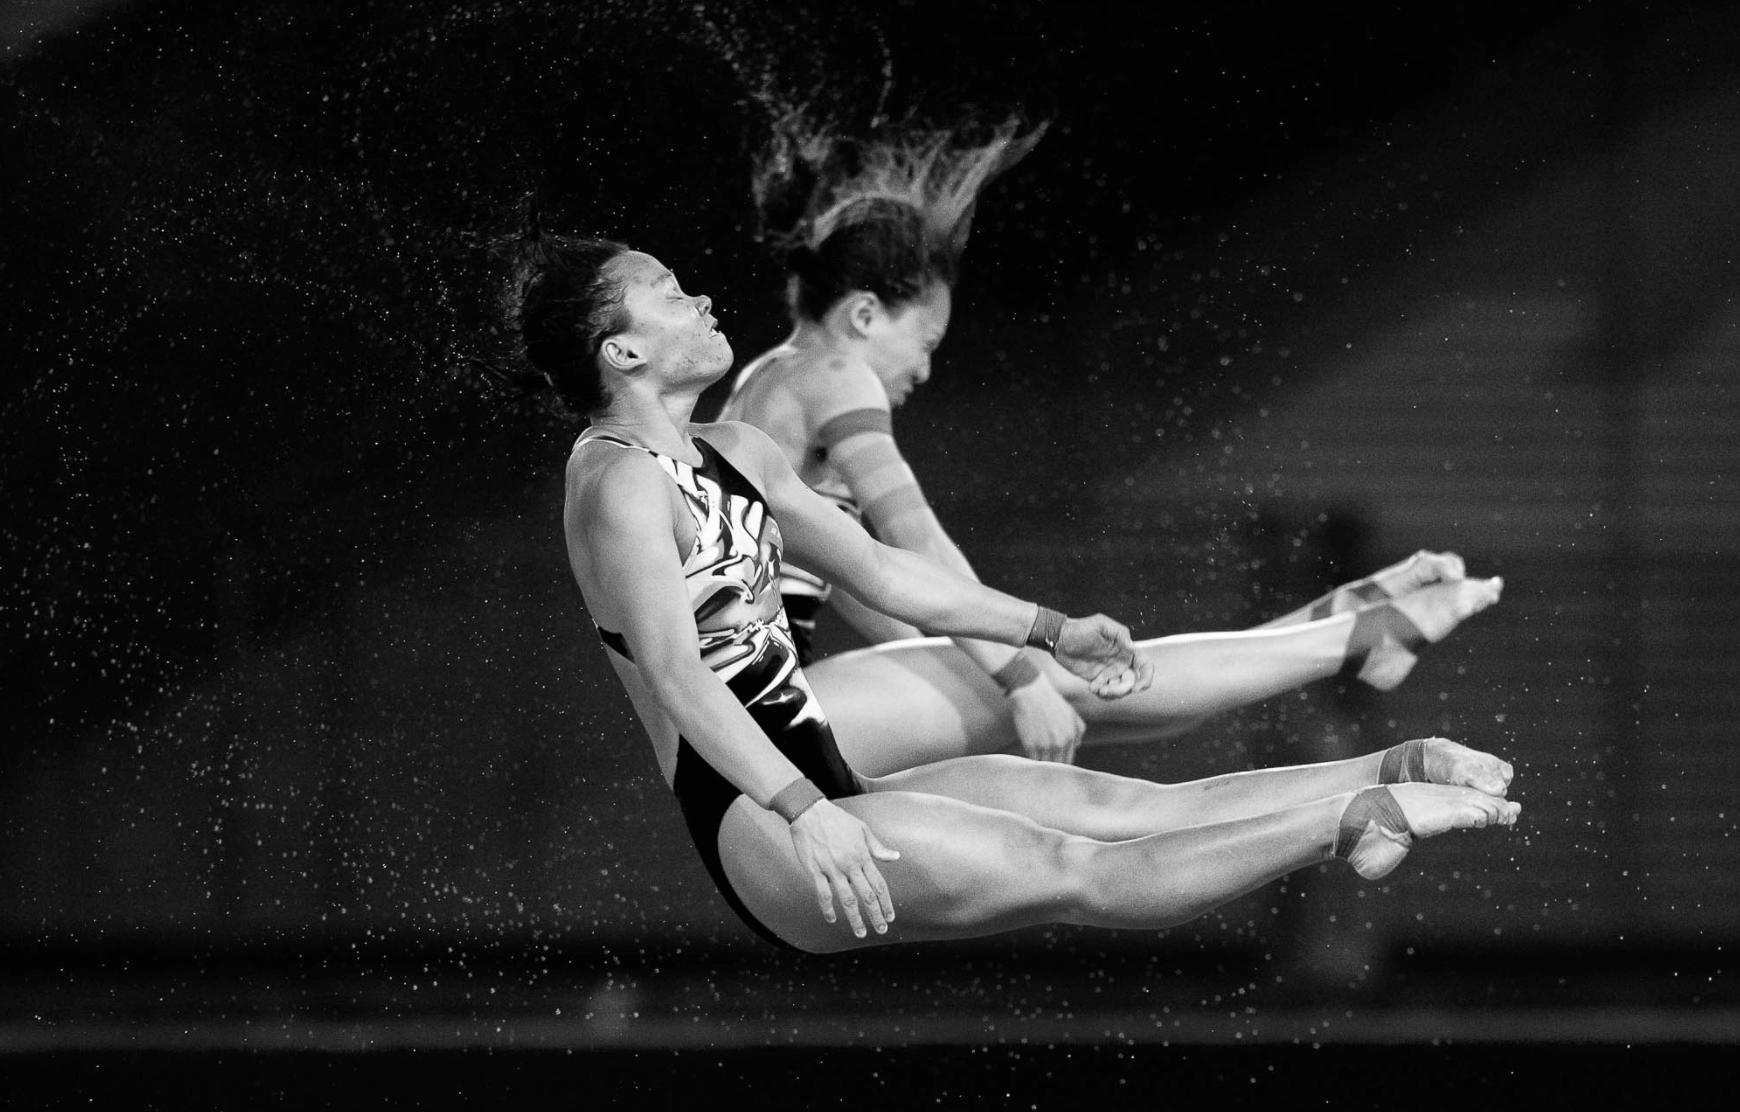 Chris Schmid – athletes – photography nature, sport